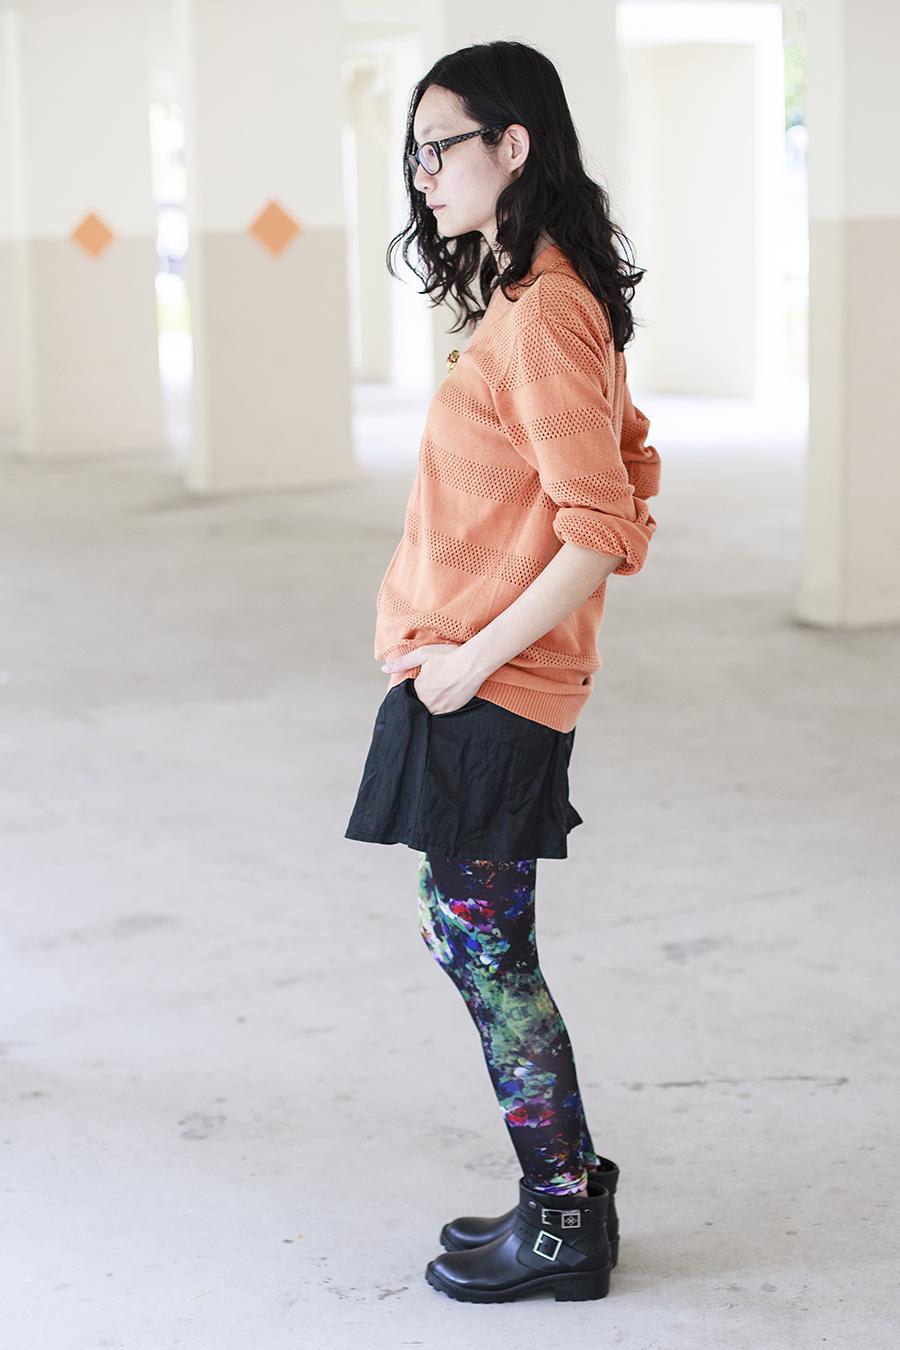 Gap black frame glasses, Forever 21 orange oversized boyfriend cardigan, vintage gold rose brooch, H&M printed leggings and Dav black rain booties c/o Shopbop, M)phosis black metallic skirt.